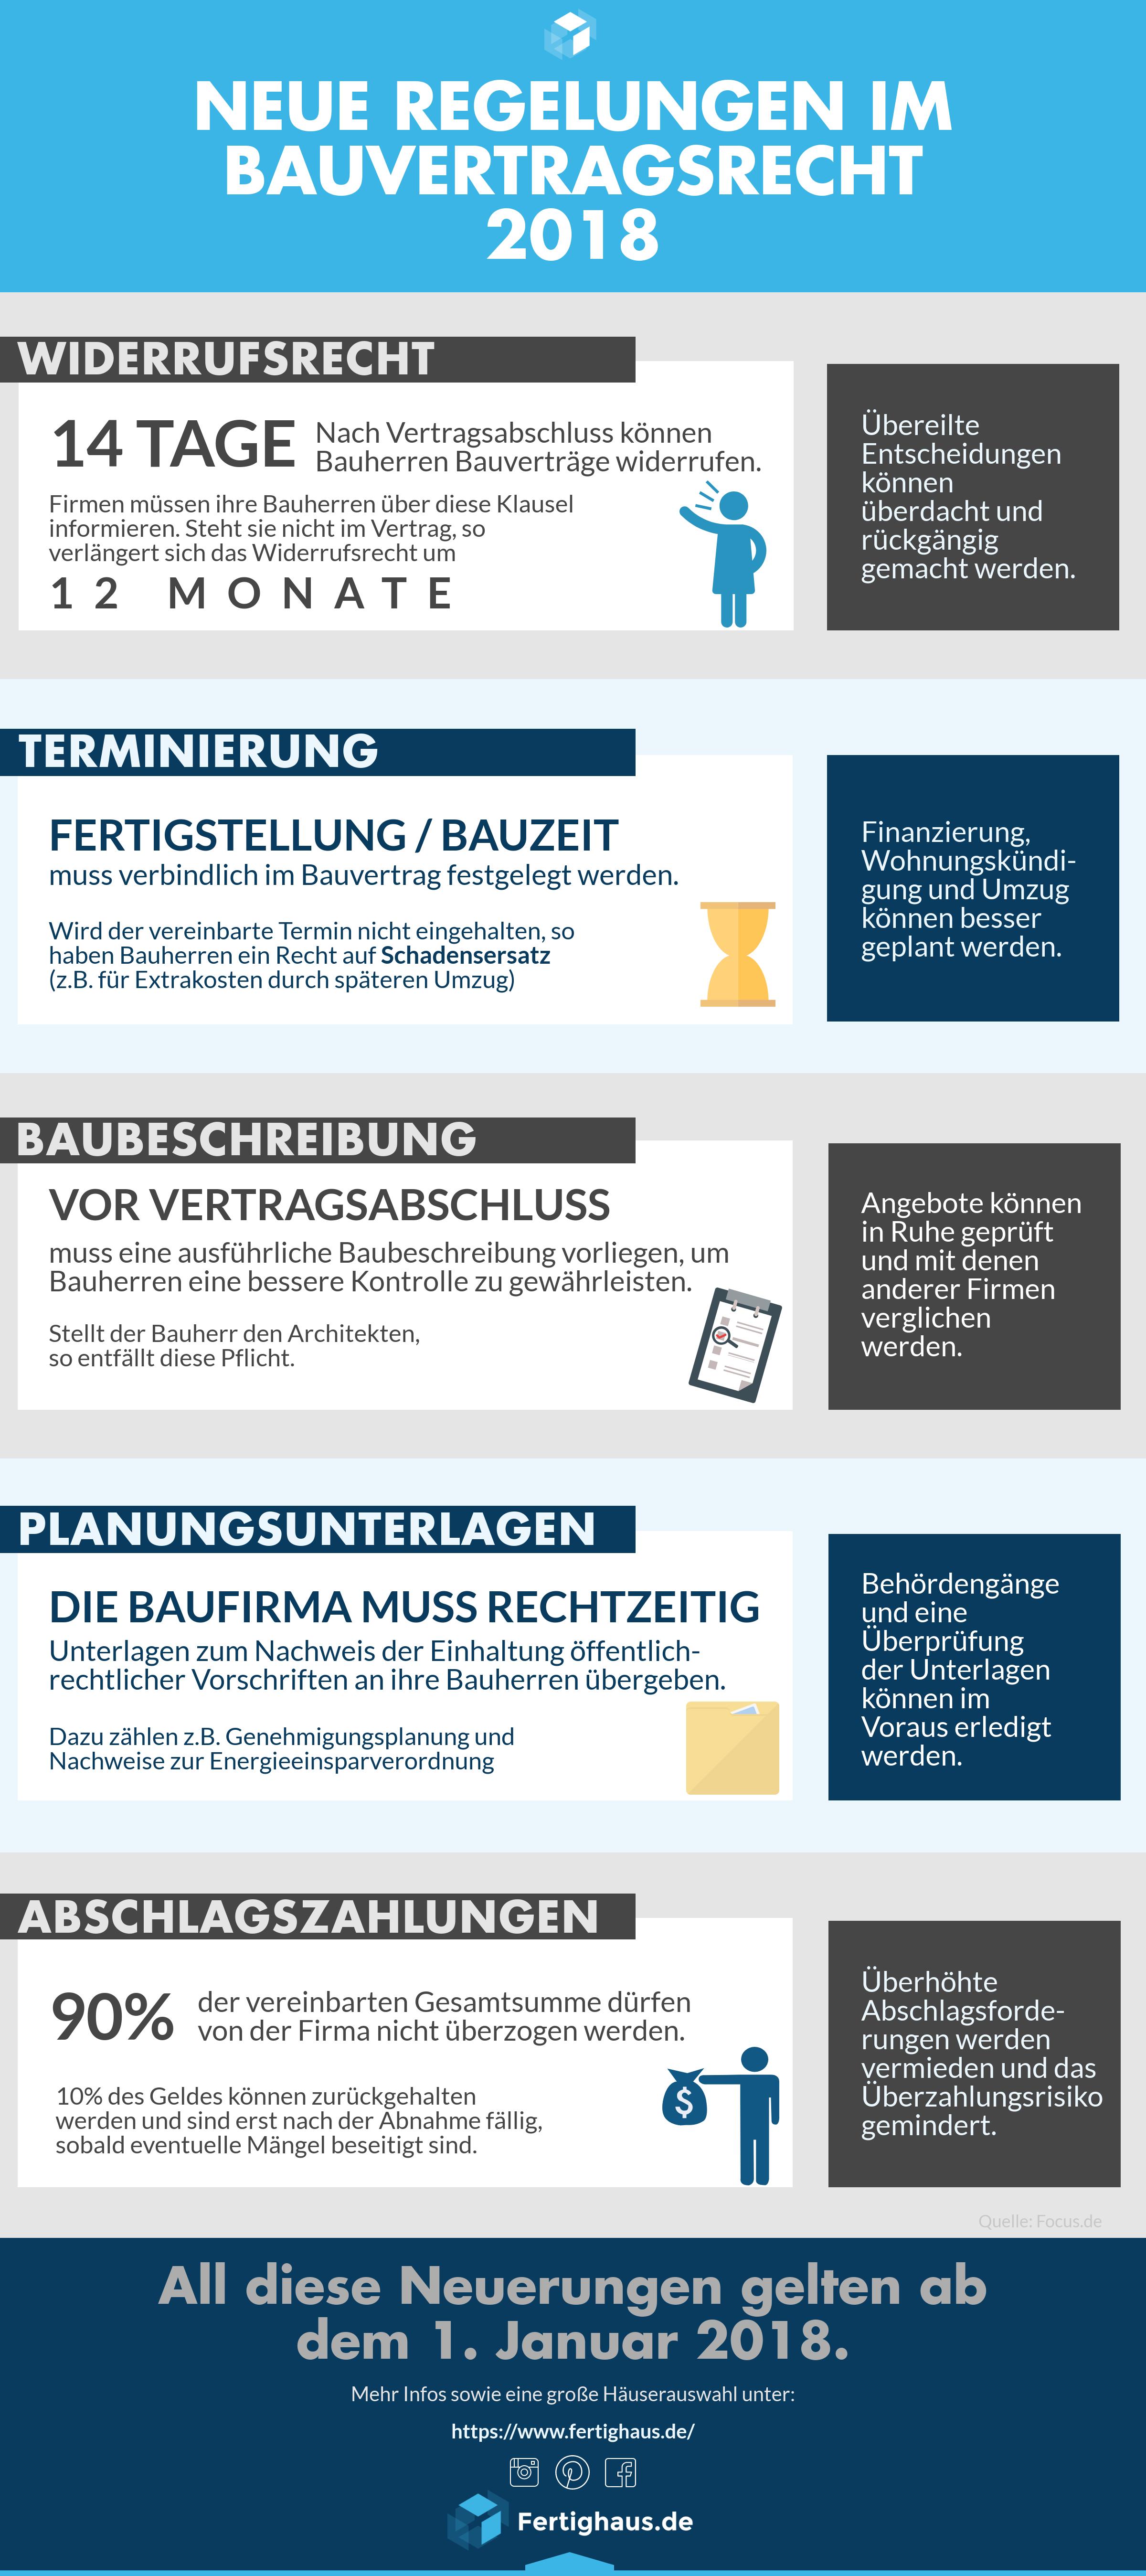 Reform Des Bauvertragsrechts 2018 Bau Hausbau Kosten Hausbau Tipps